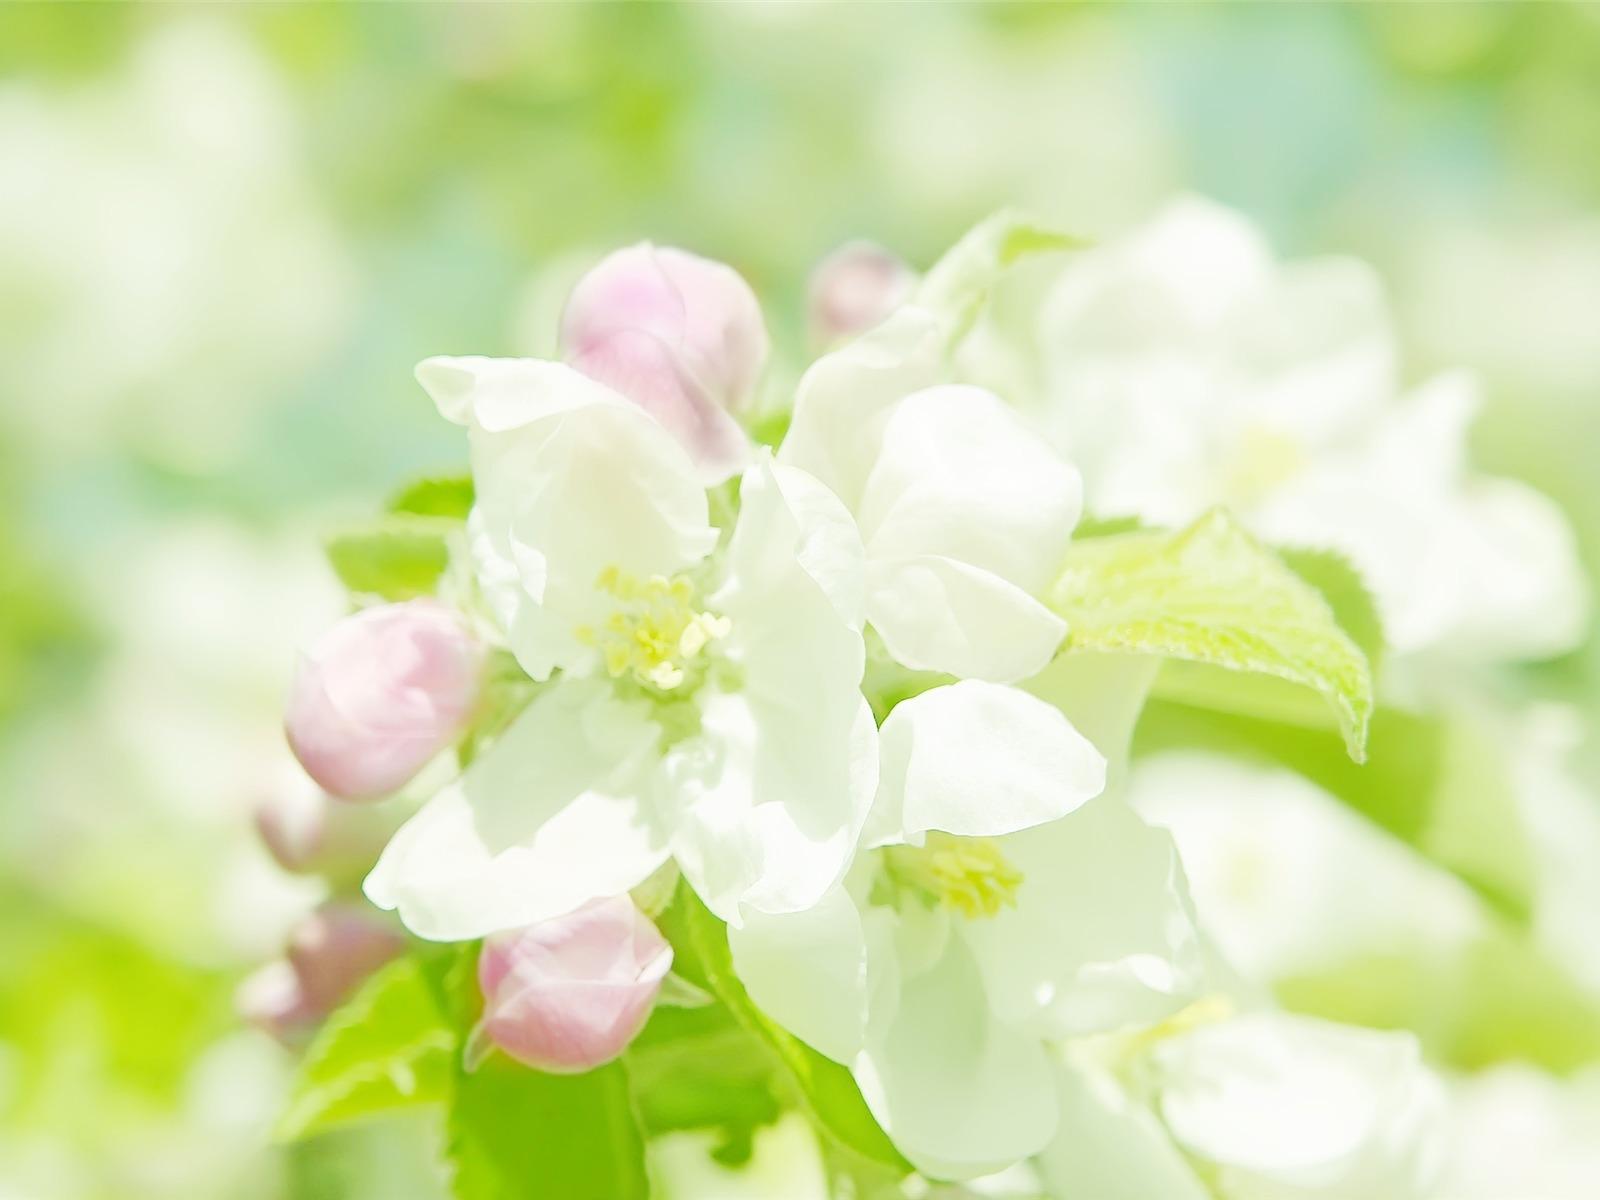 printemps fleurs floraison fond d 39 cran aper u. Black Bedroom Furniture Sets. Home Design Ideas